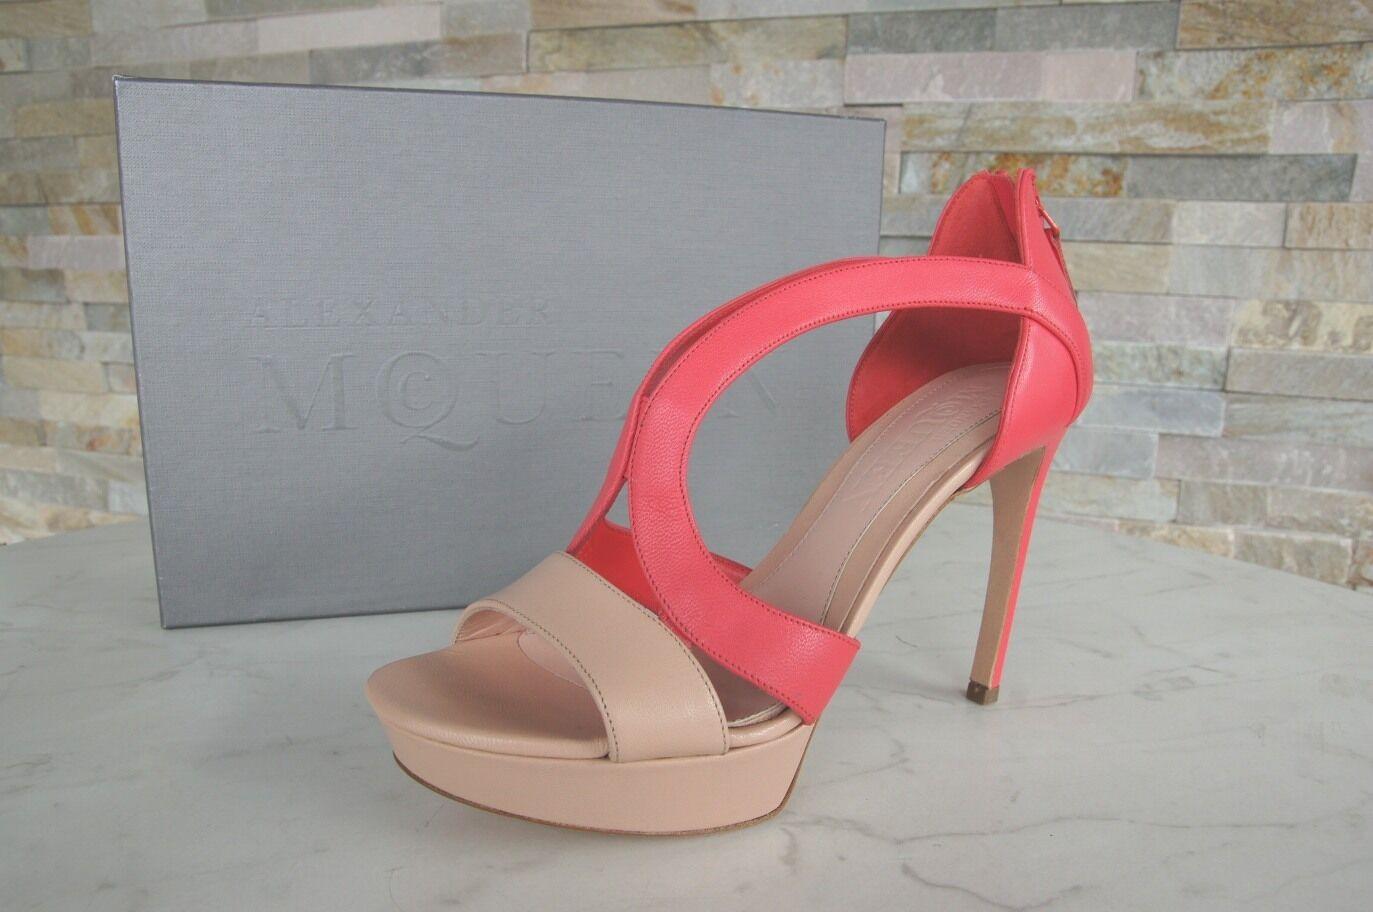 Alexander McQueen Platform Sandals Heels scarpe Geranium NUOVO   liquidazione fino al 70%